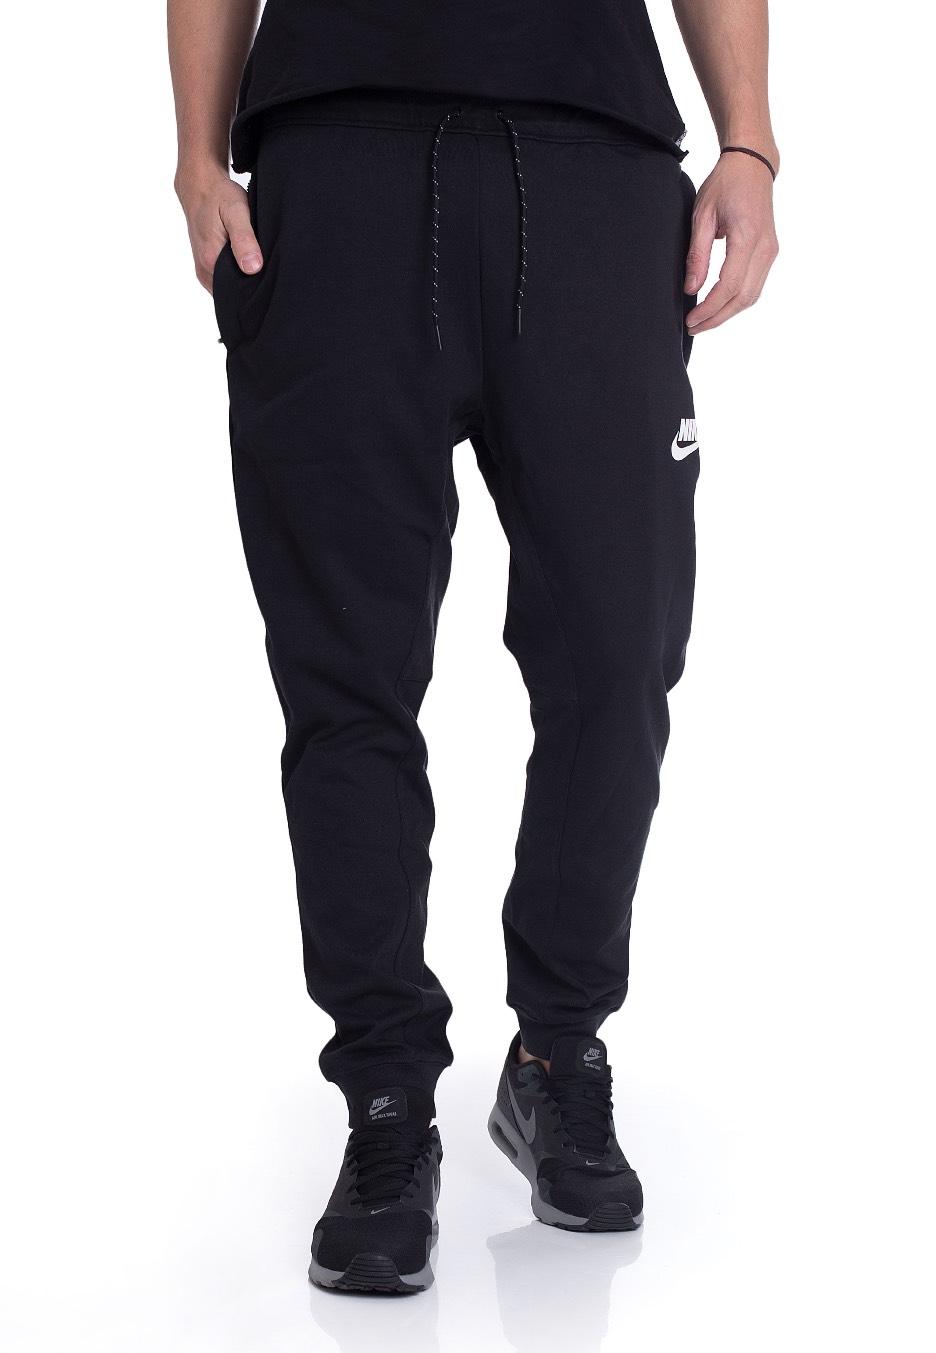 c2b3700ea Nike - Advance 15 Black/Black/White - Sweat Pants - Streetwear Shop -  Impericon.com Worldwide